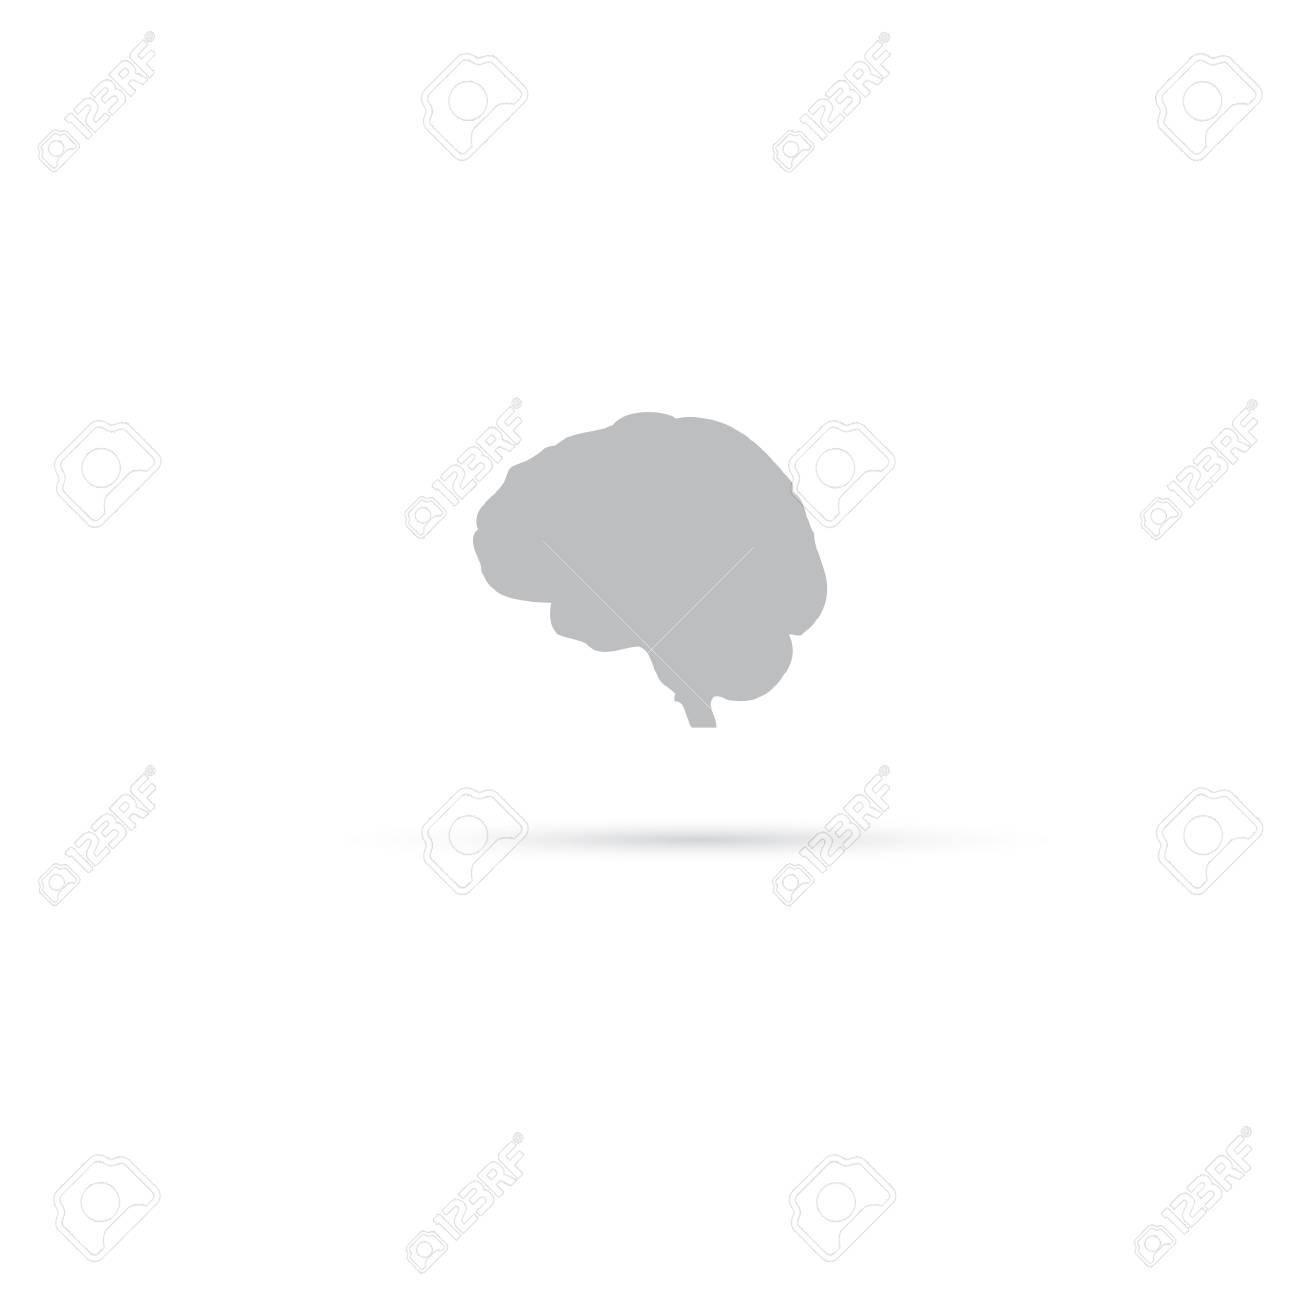 brain icon. vector illustration. human organs. Stock Vector - 21732121